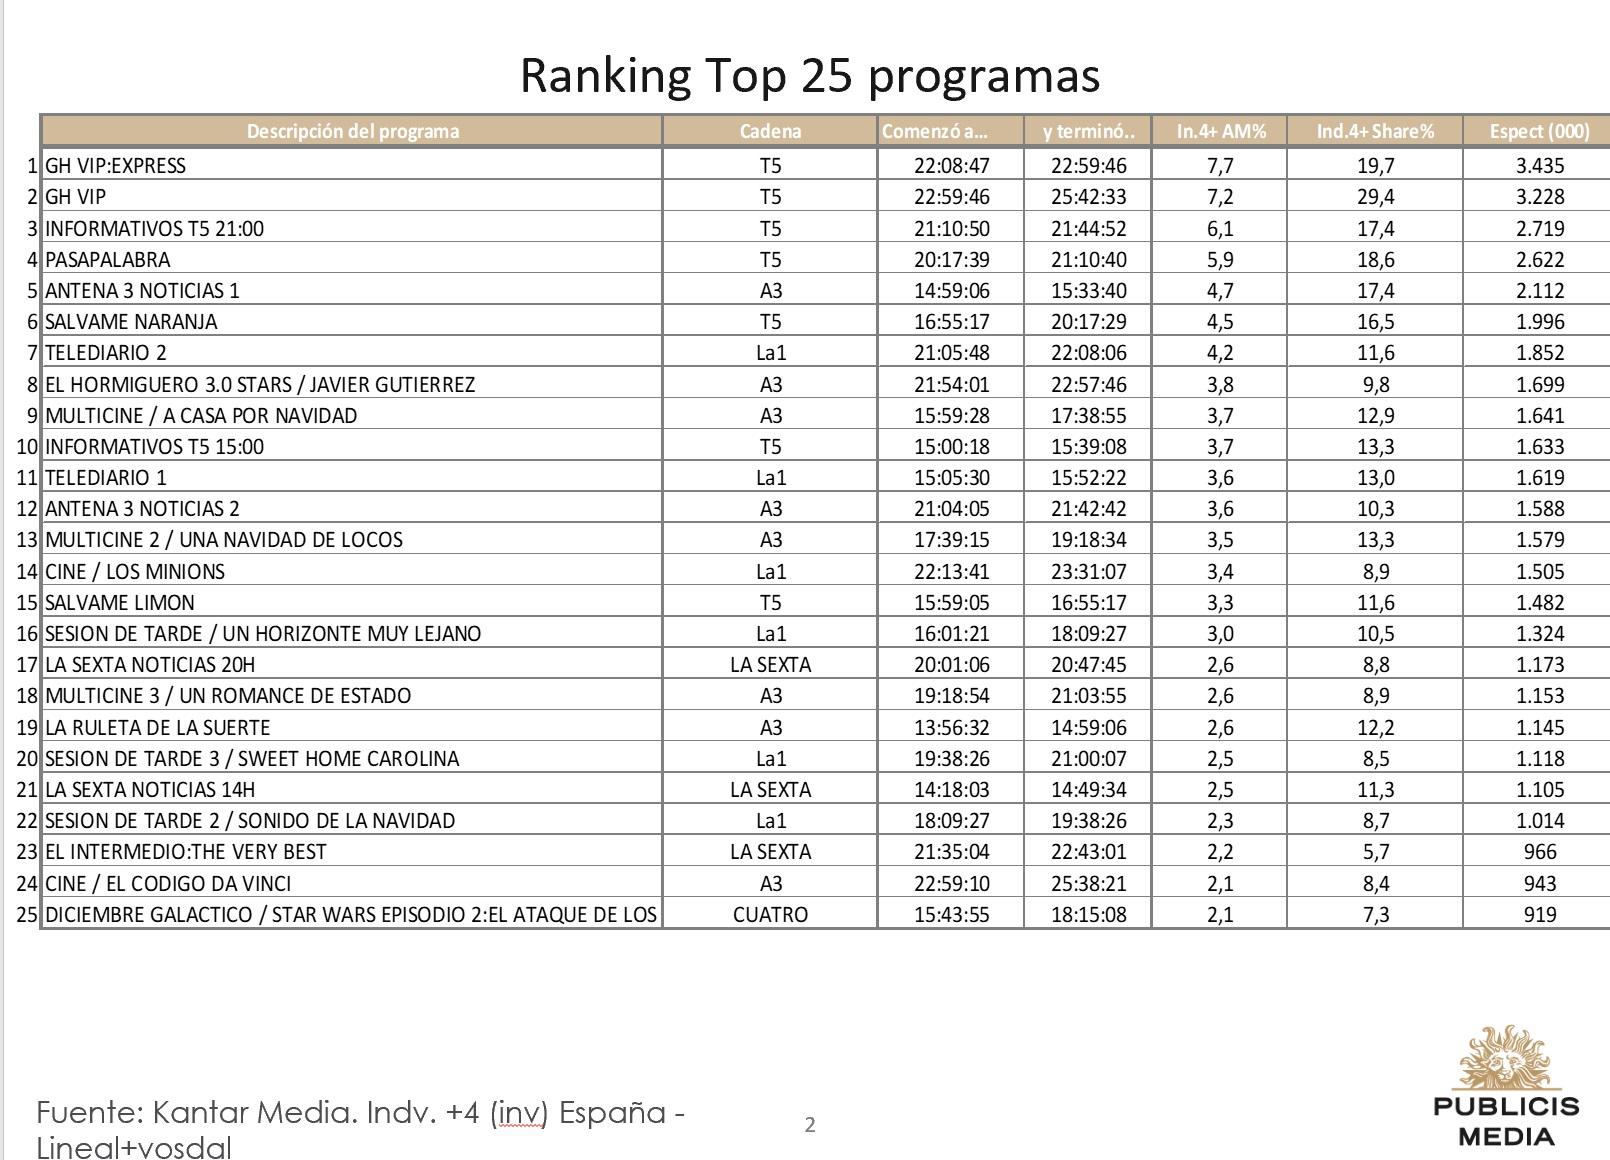 https://www.programapublicidad.com/wp-content/uploads/2018/12/Top-25-Publicis-media-6-dic-2018-programapublicidad-muy-grande.jpg